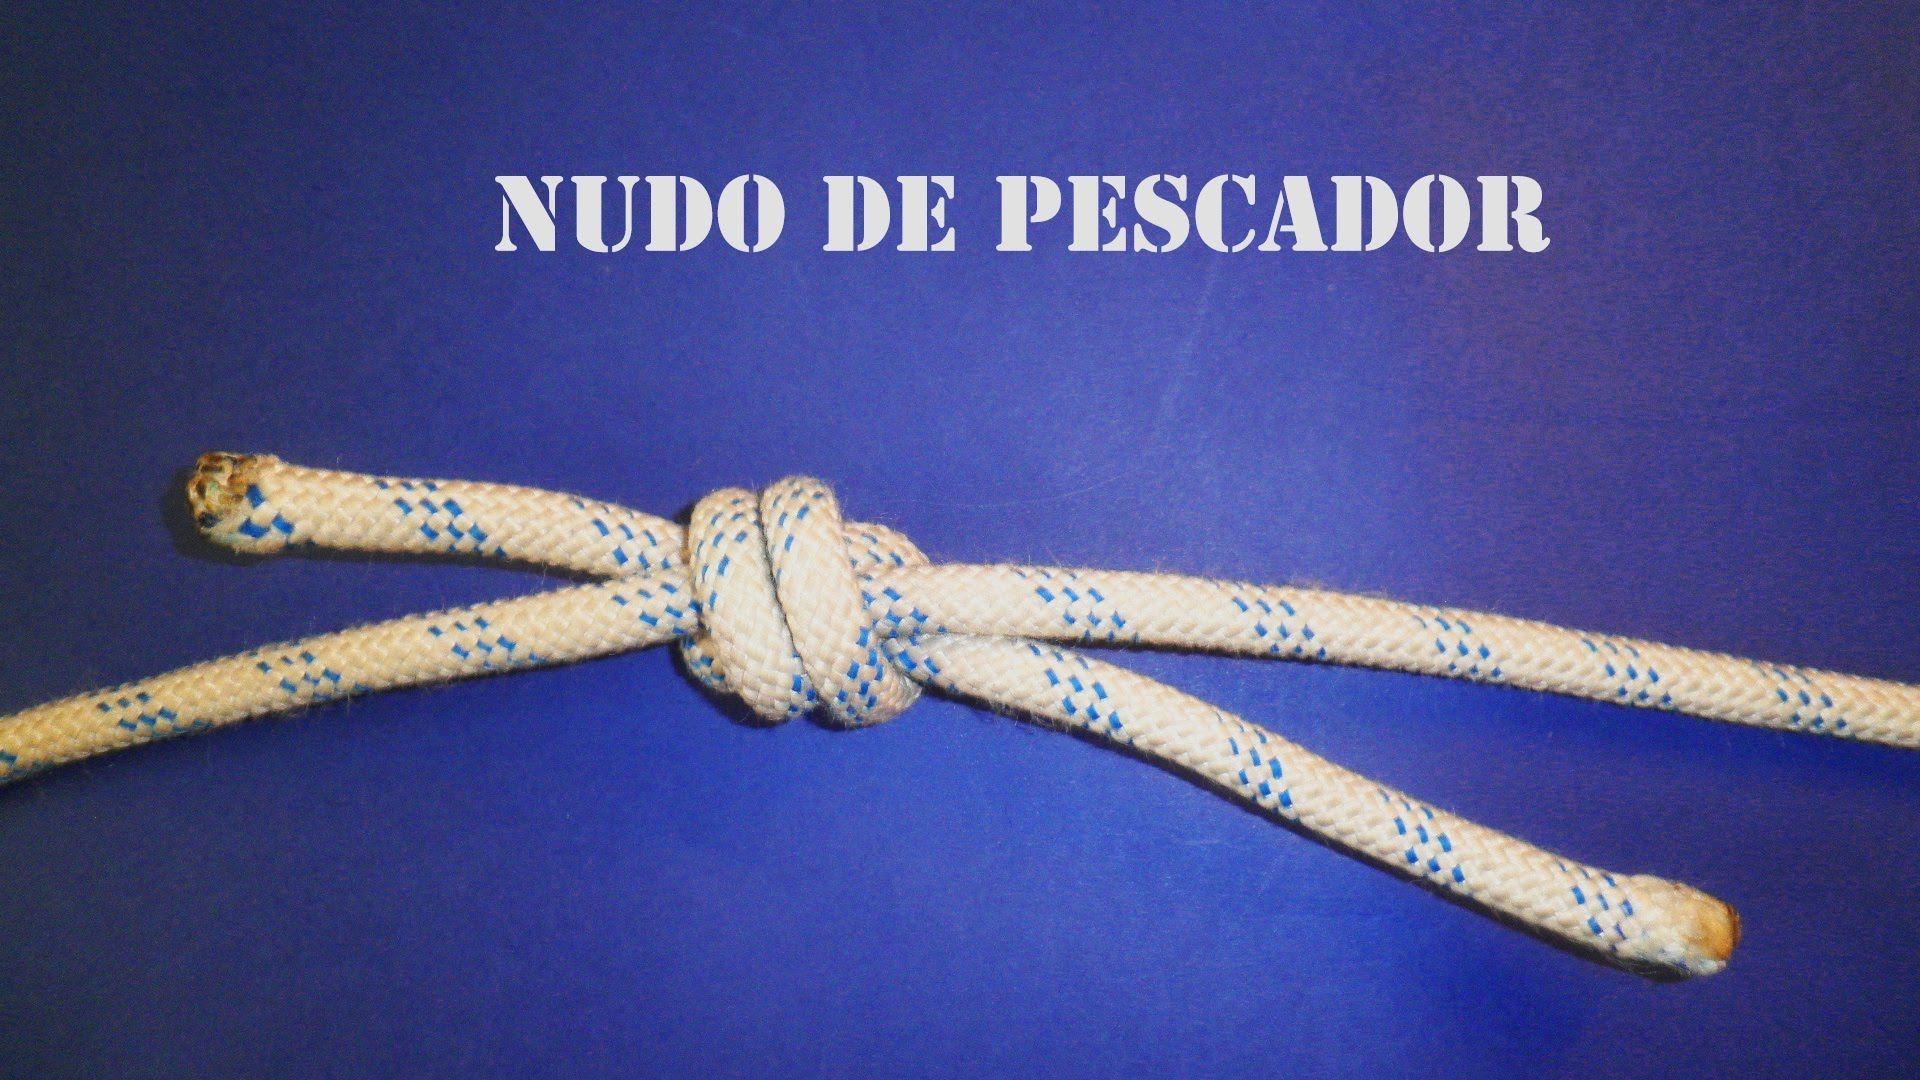 NUDO DE PESCADOR (1080 HD)   Nudos náuticos   Pinterest   Nudo de ...